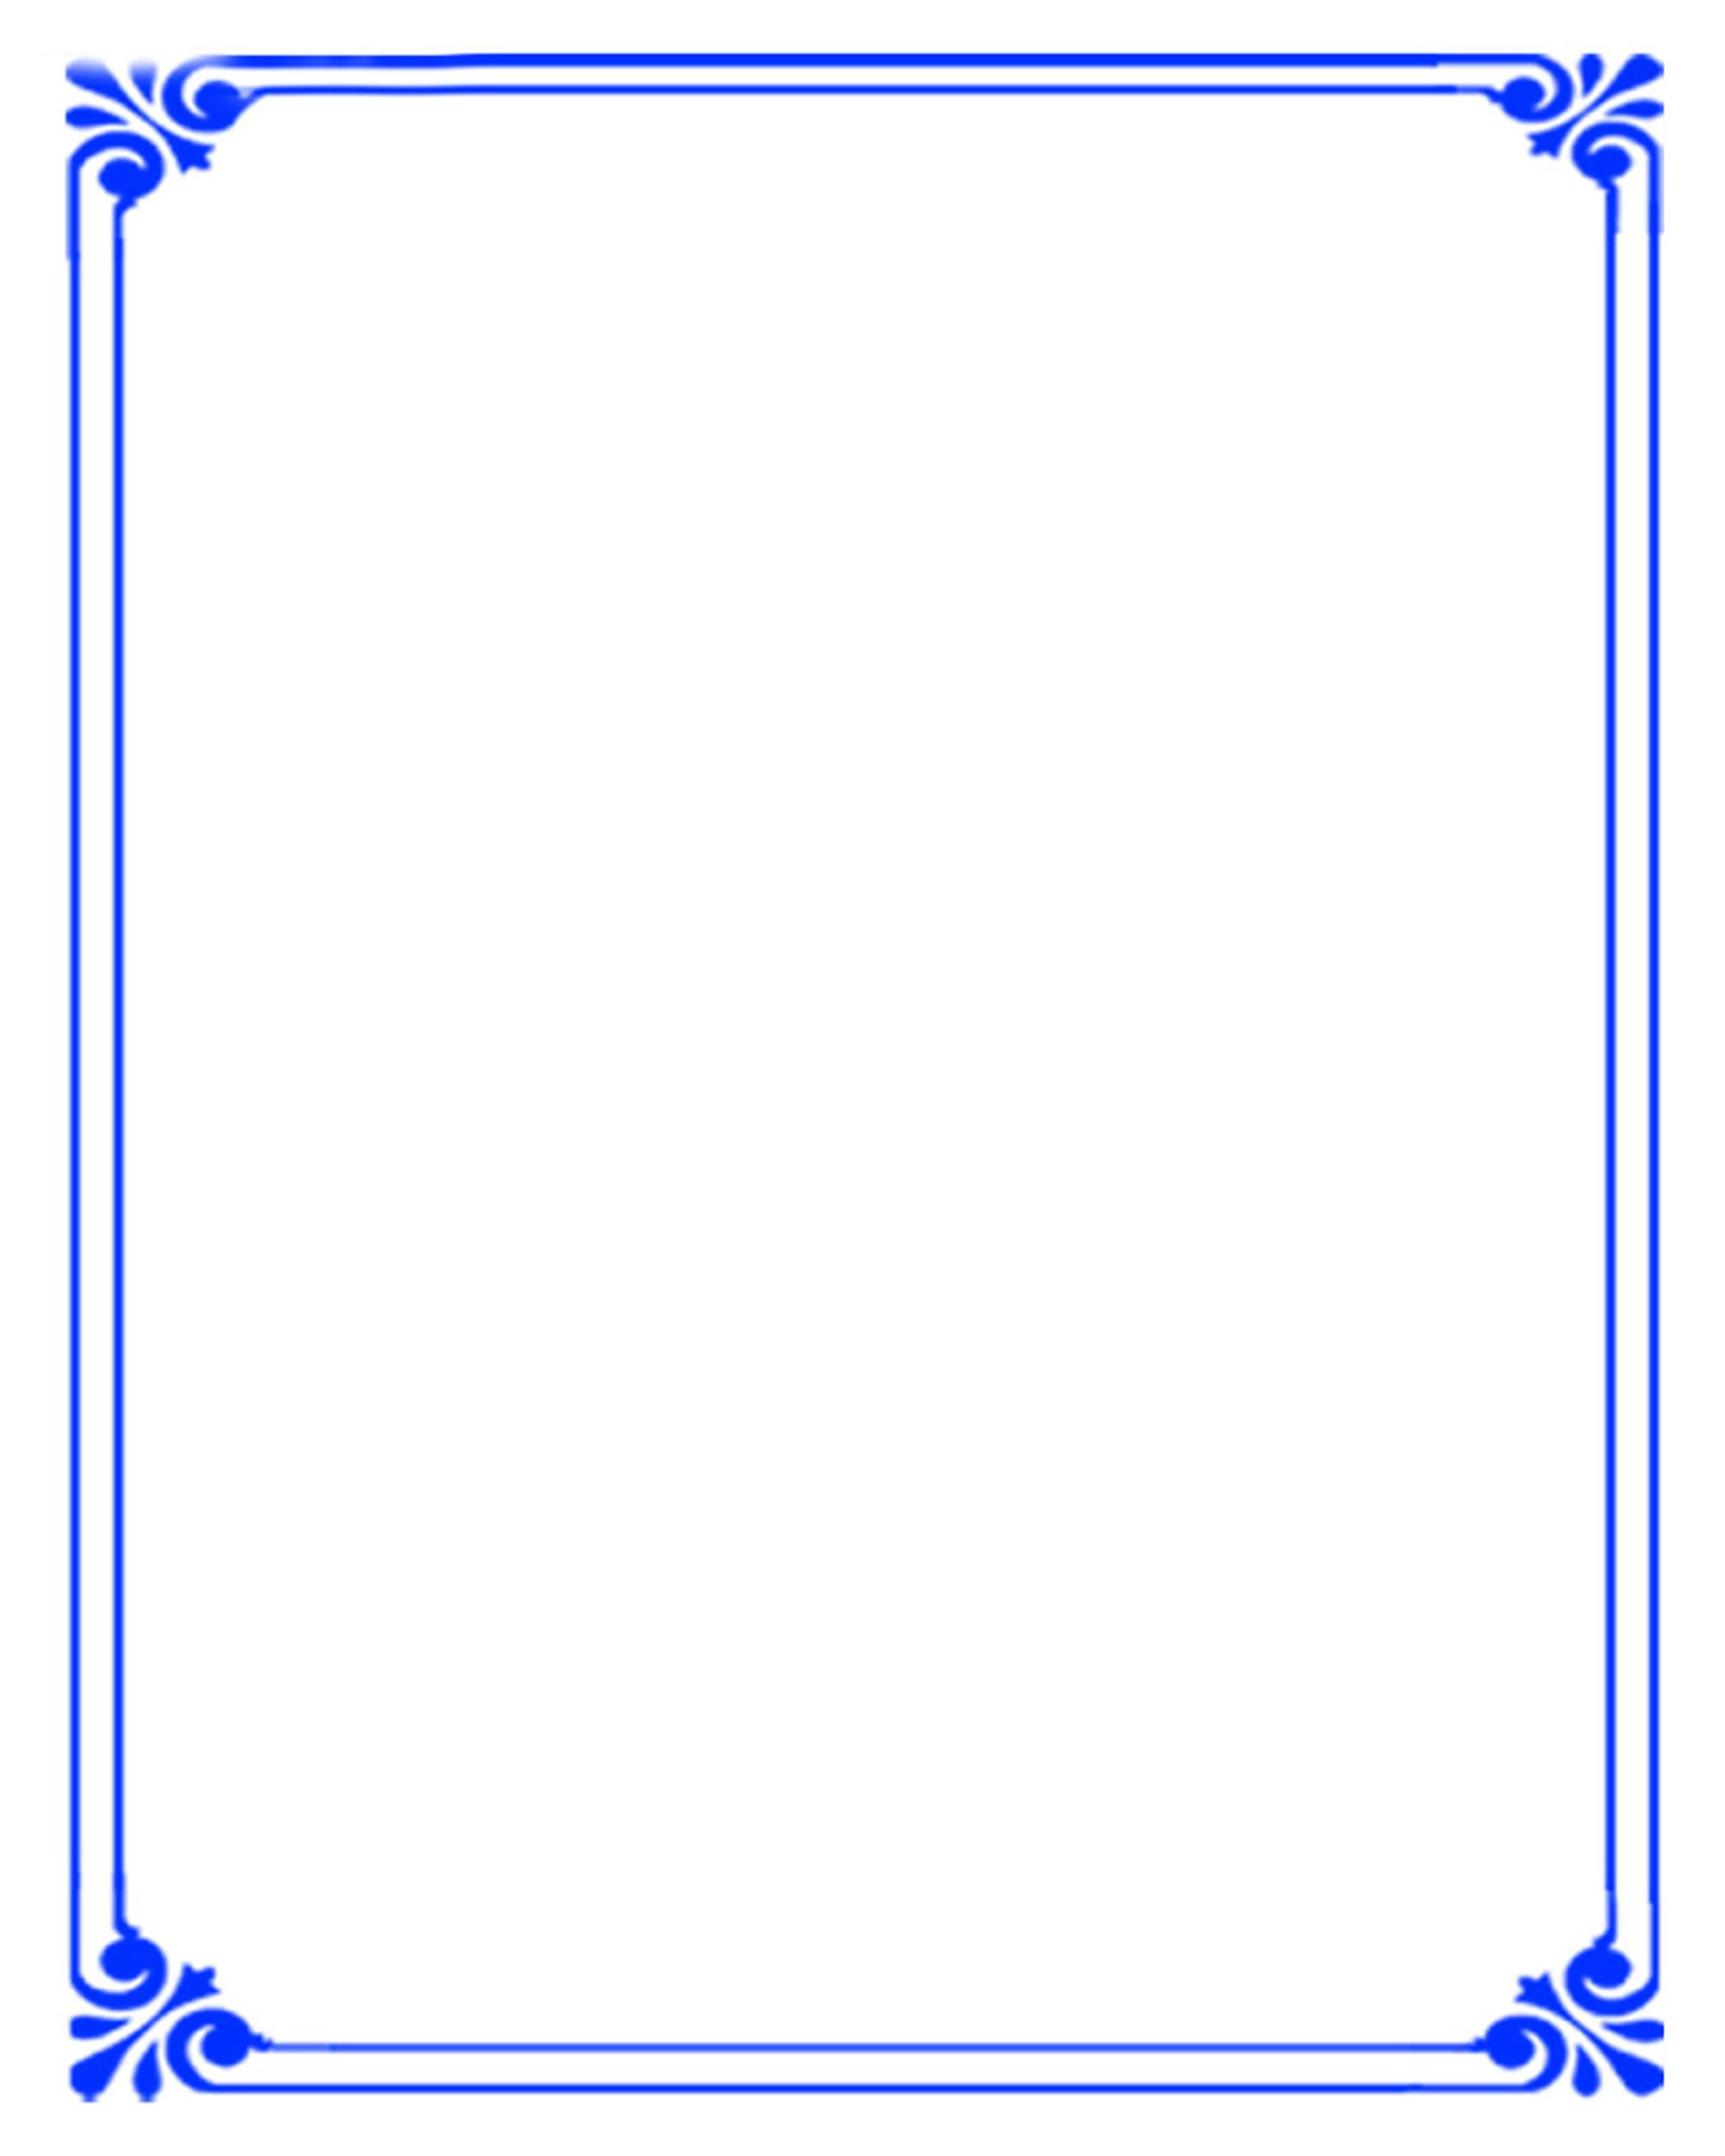 Simple Background Blue Border Simple Frame Border